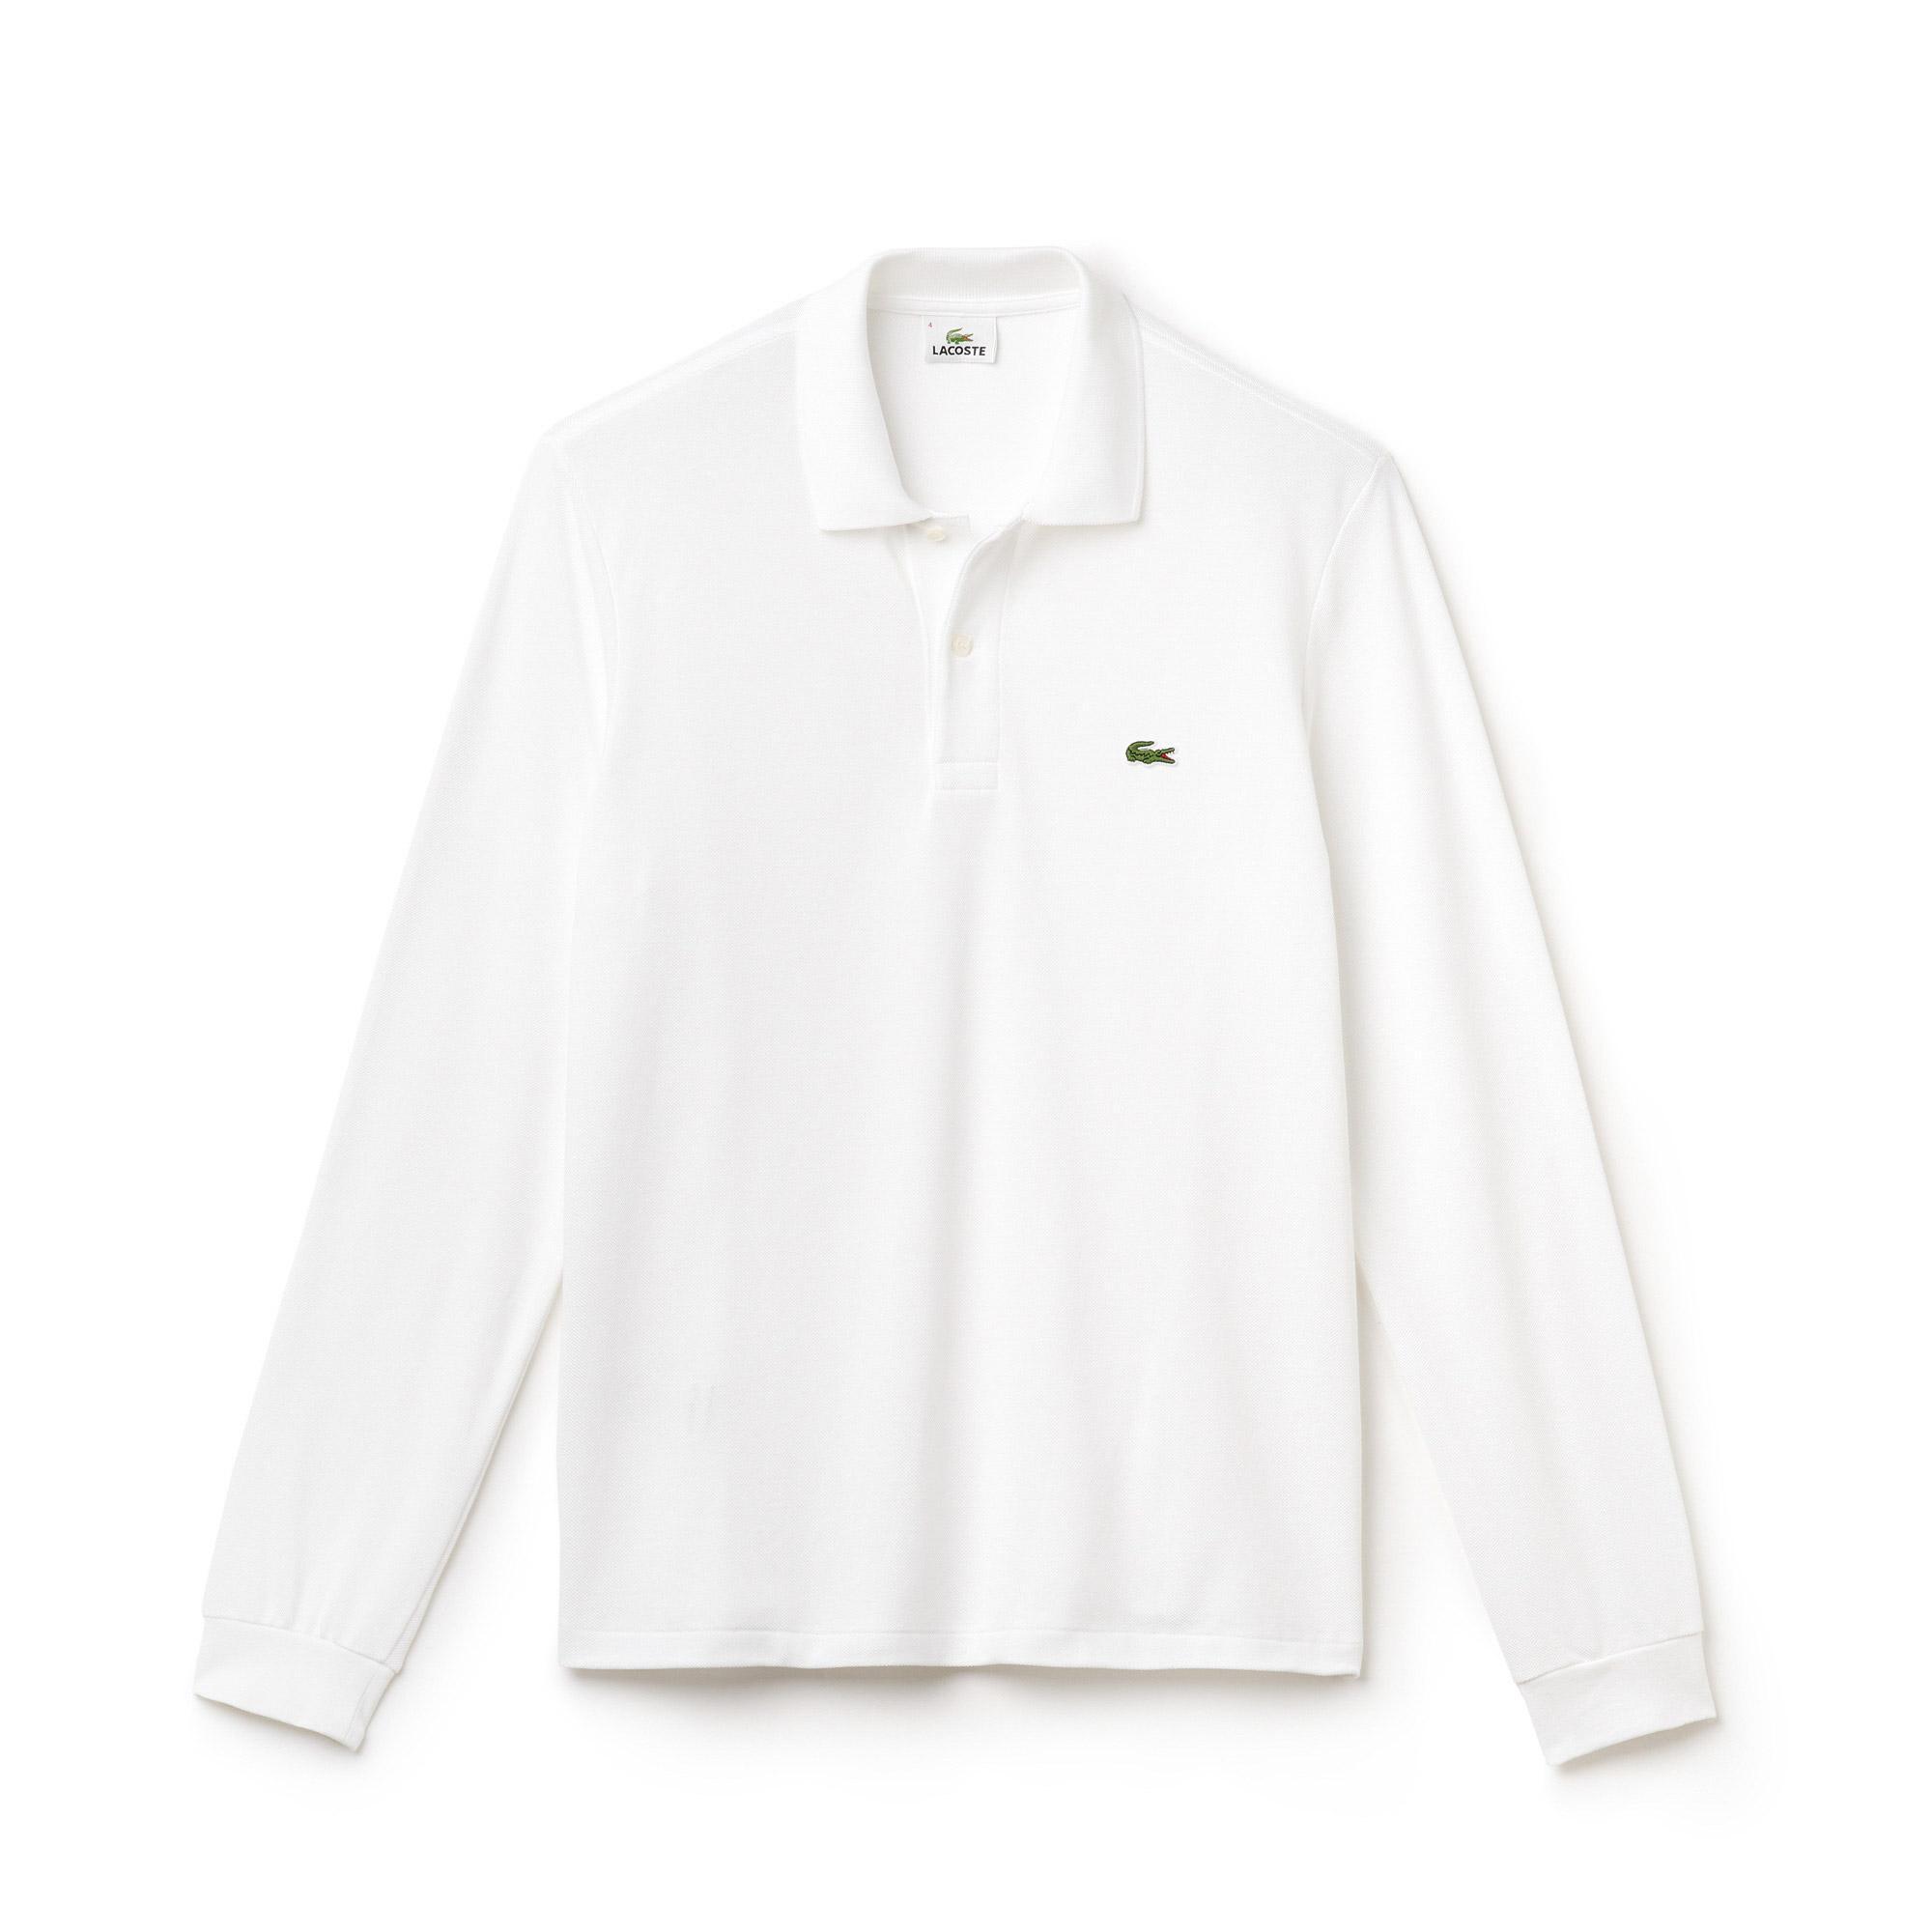 Lacoste Erkek L1312 Beyaz Polo